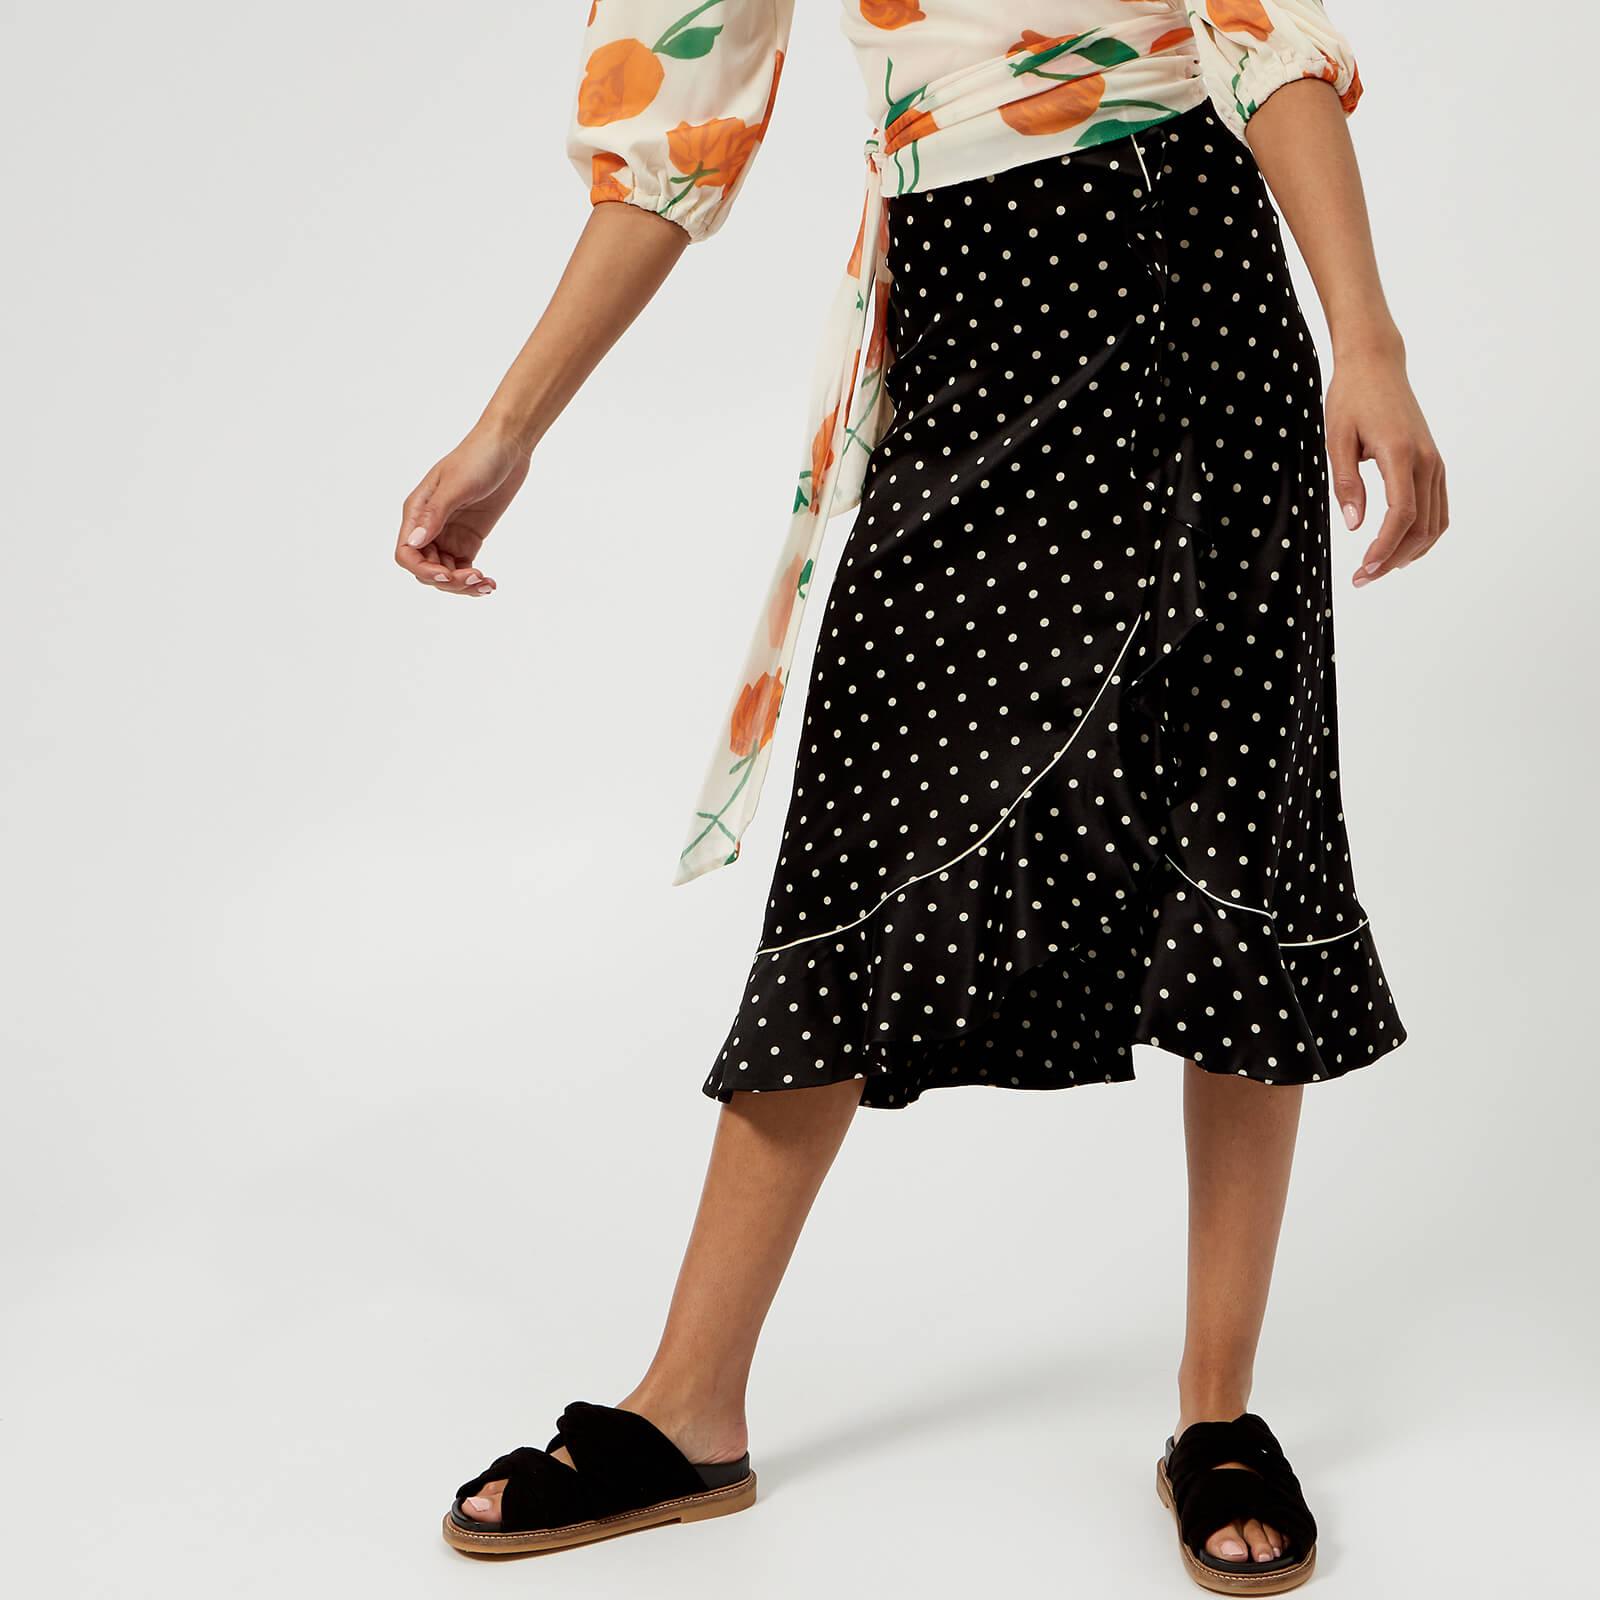 605829aa163d Ganni Women's Dufort Silk Skirt - Black - Free UK Delivery over £50